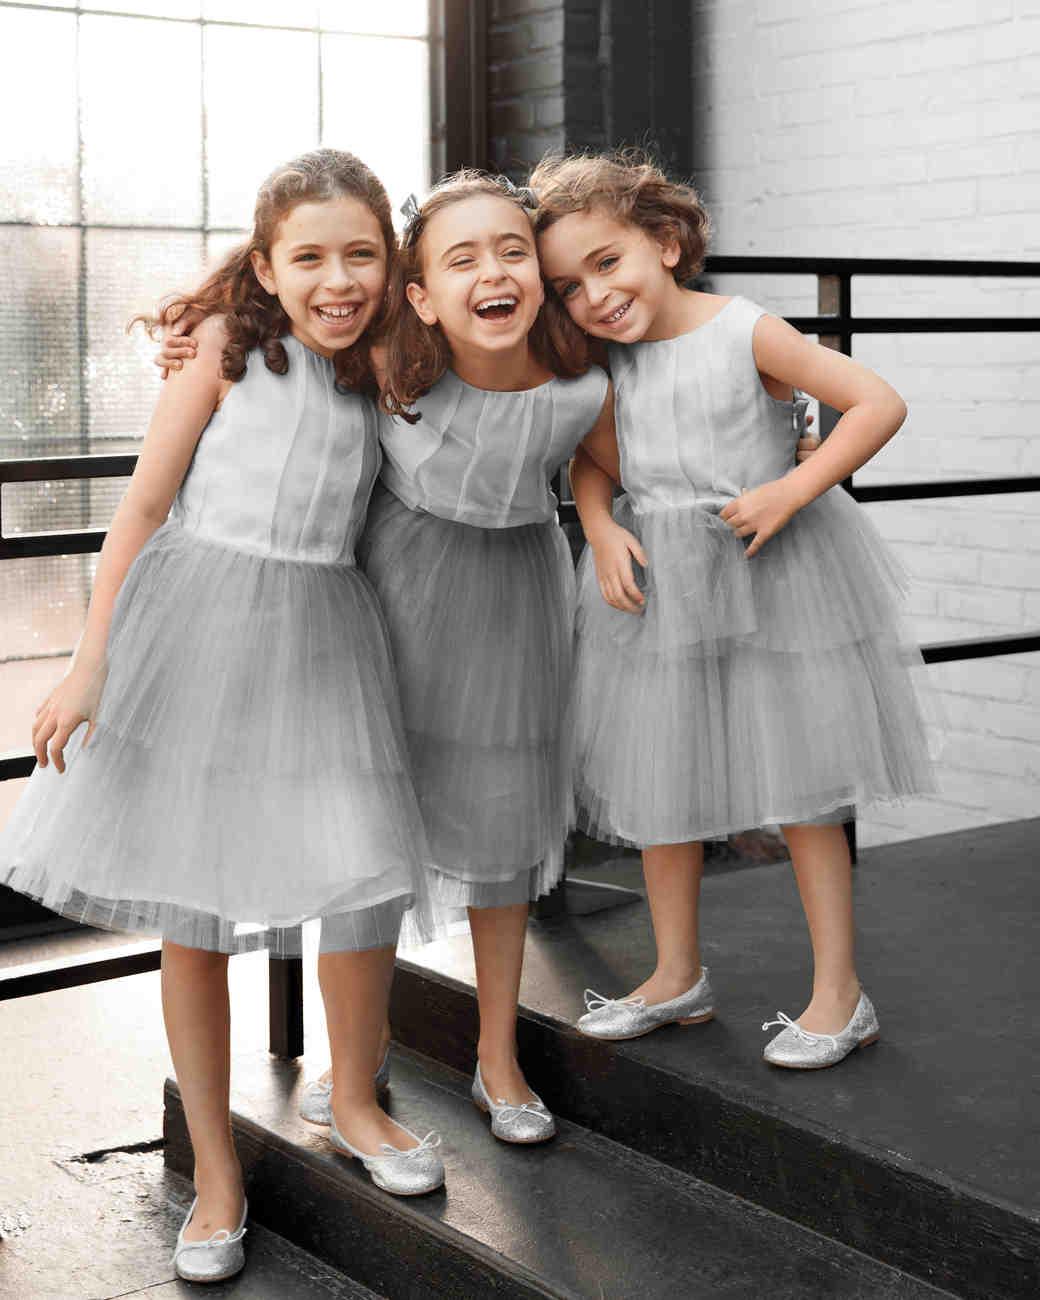 rw-anthony-rusty-flower-girls-1354-00973-wd110176.jpg